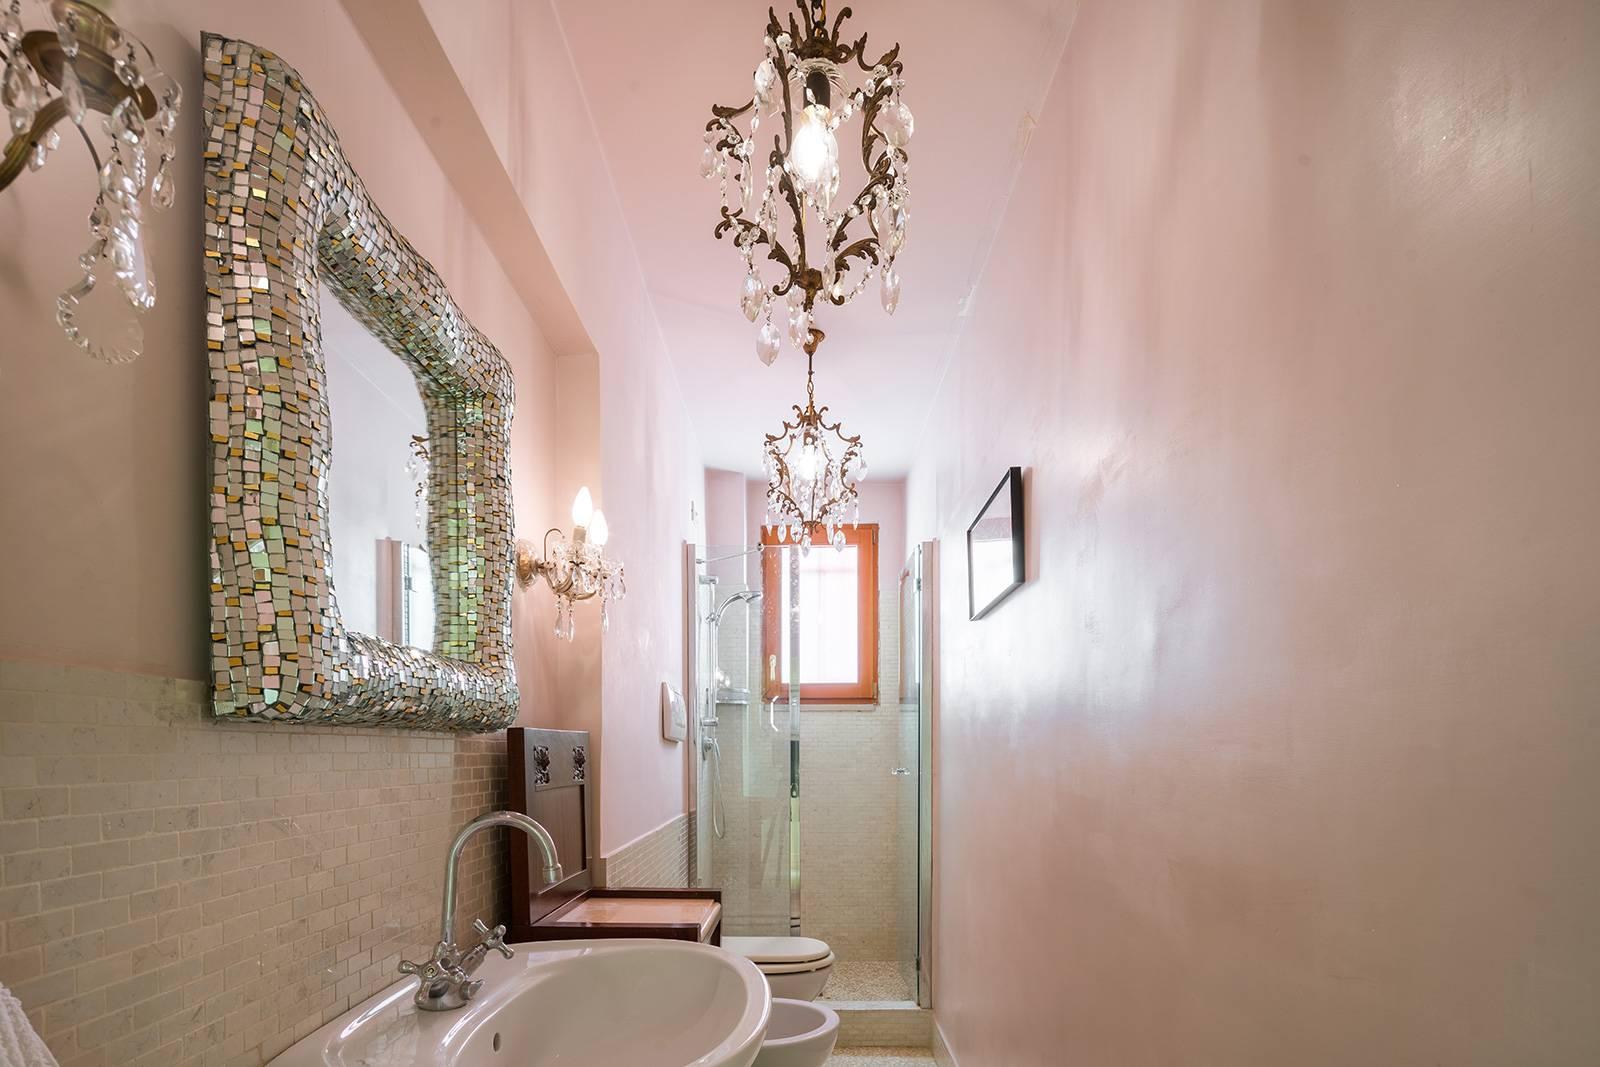 bathroom with nice shower cabin